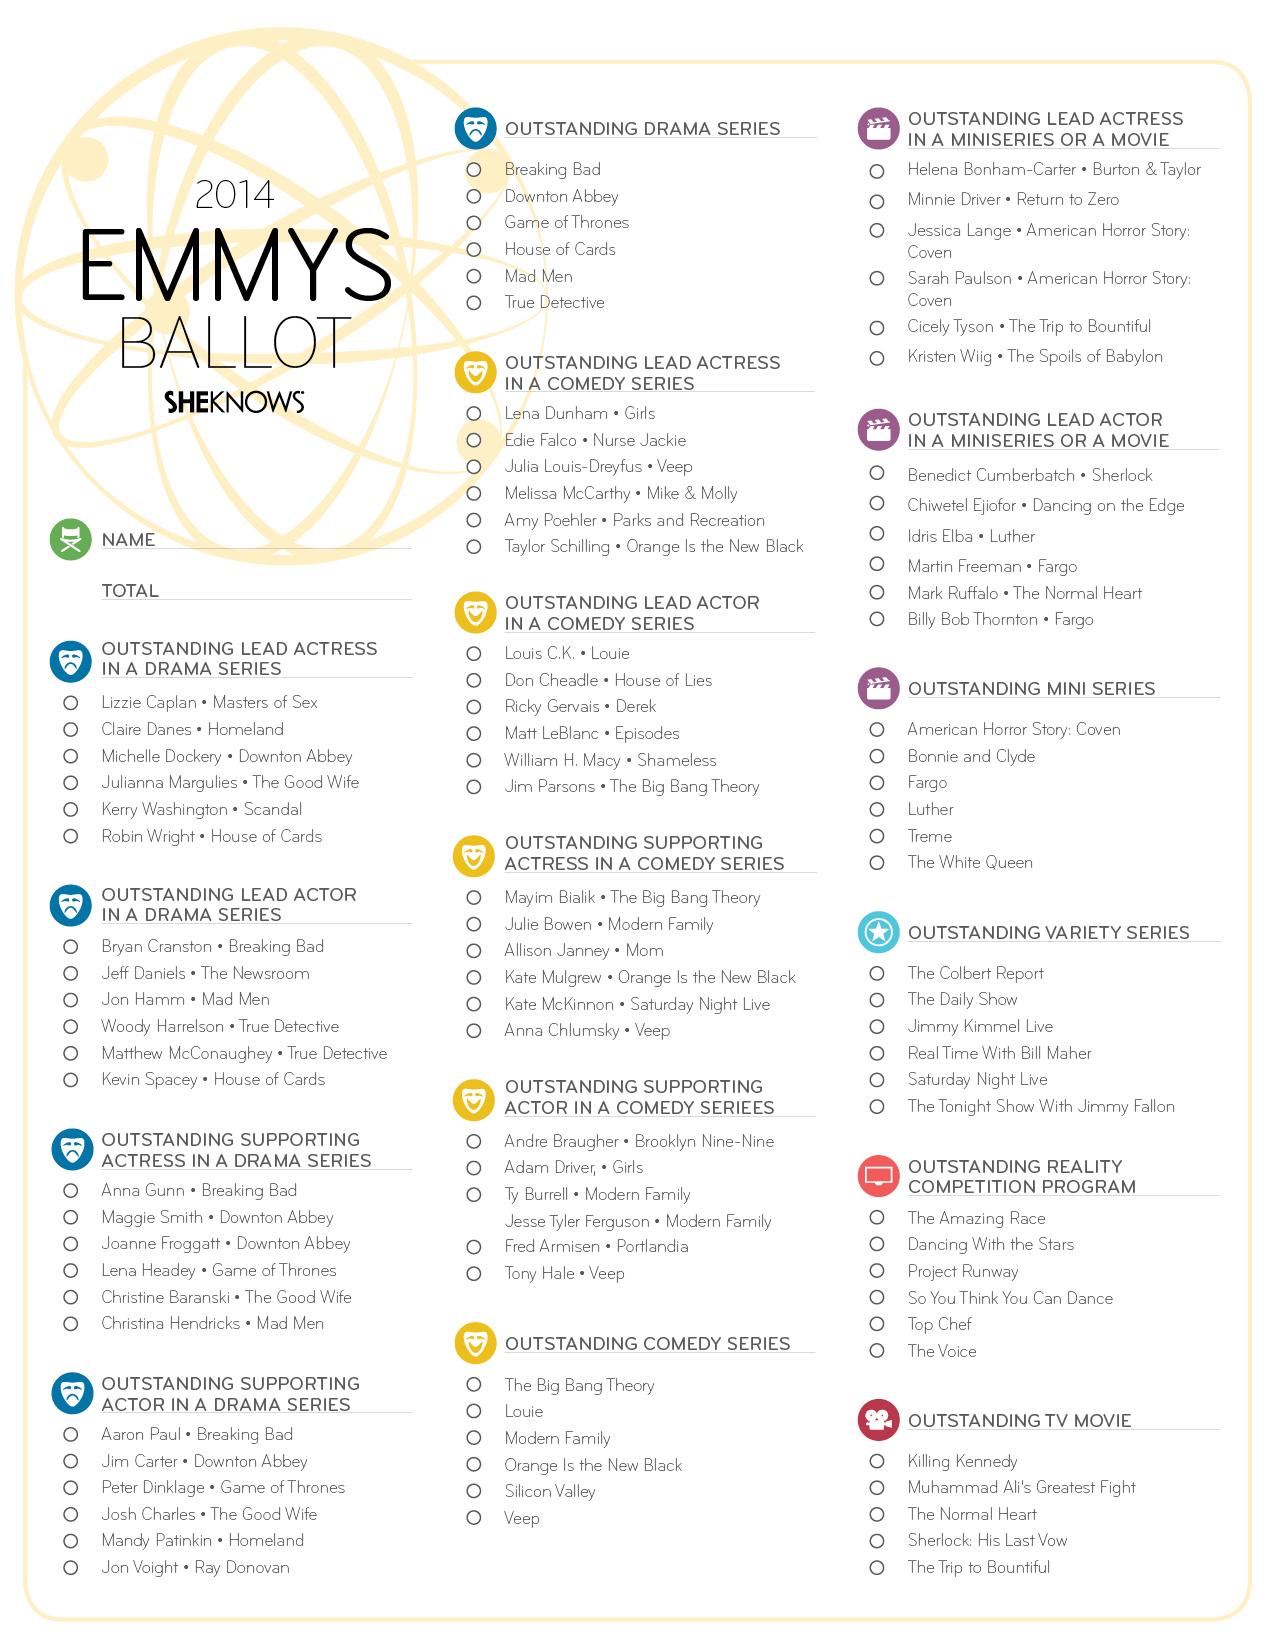 Primetime Emmys scorecard